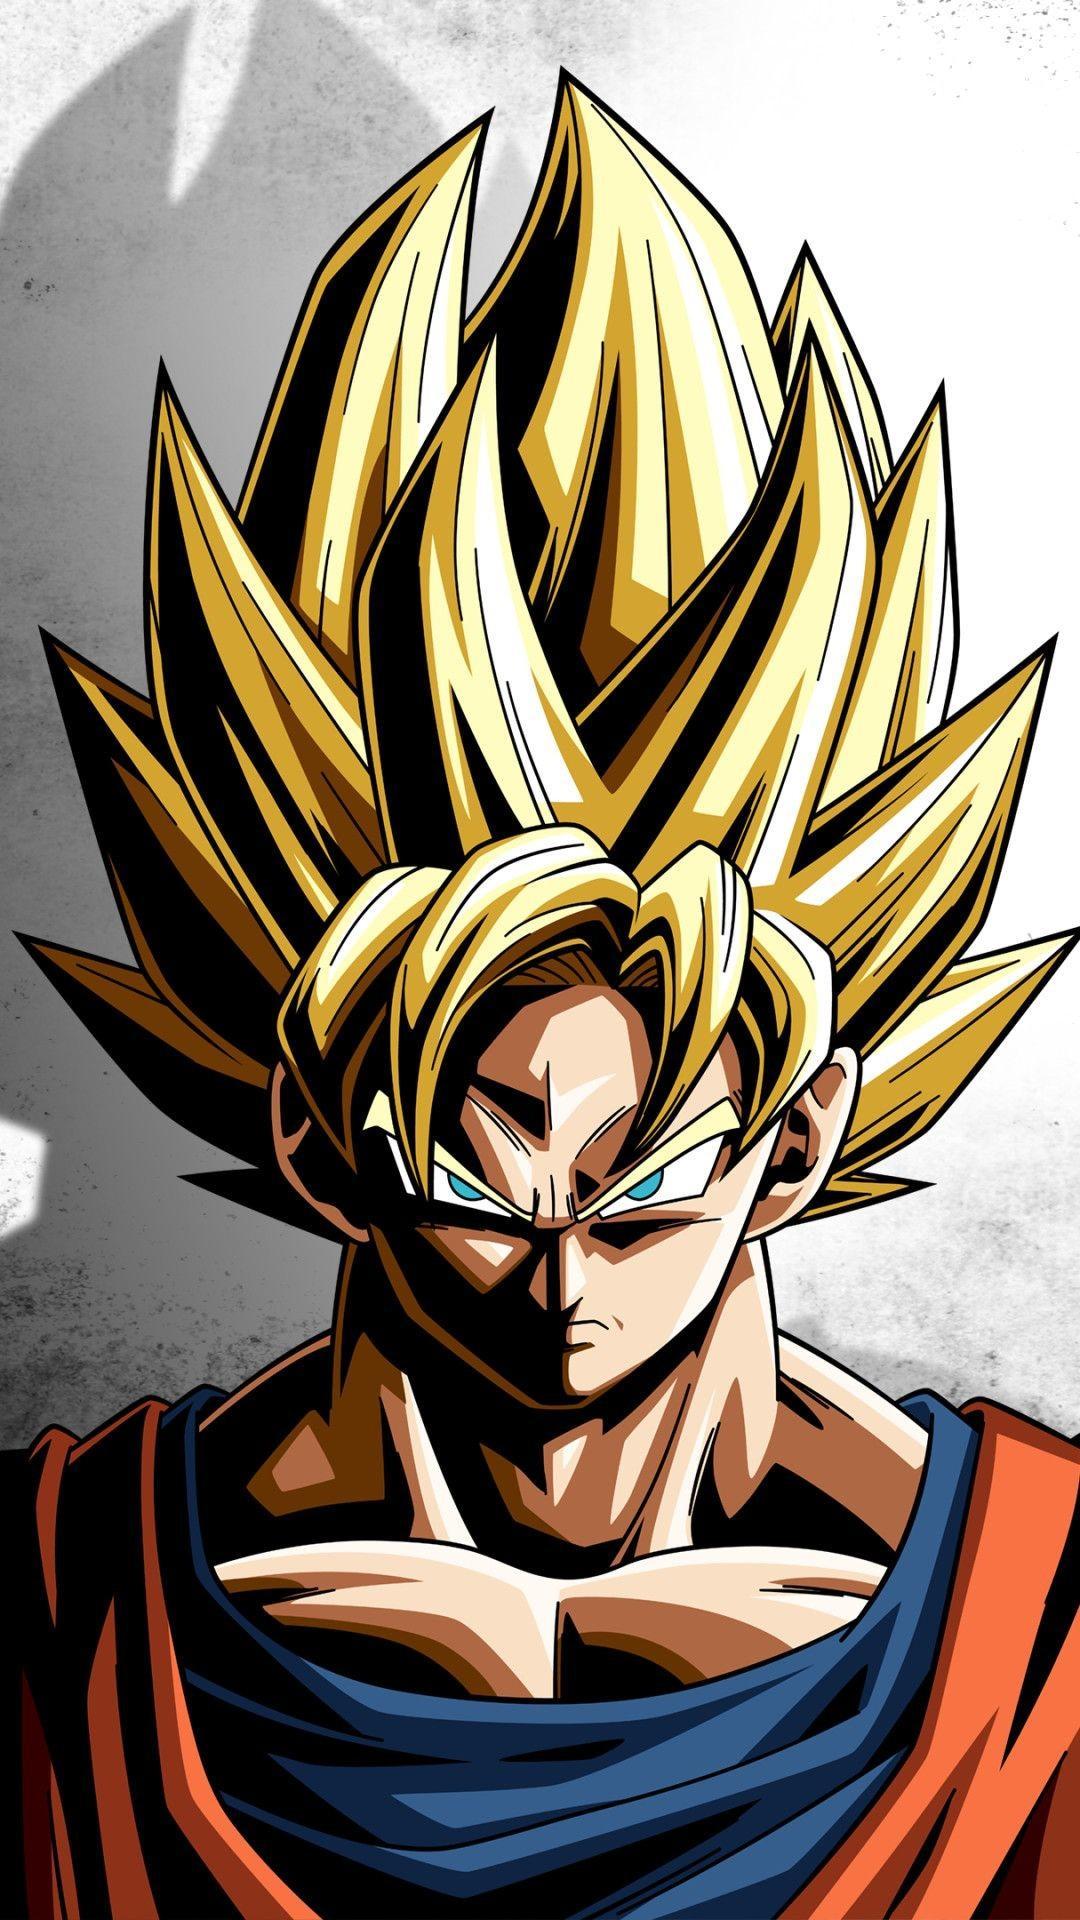 Goku Hd Mobile Wallpapers Wallpaper Cave